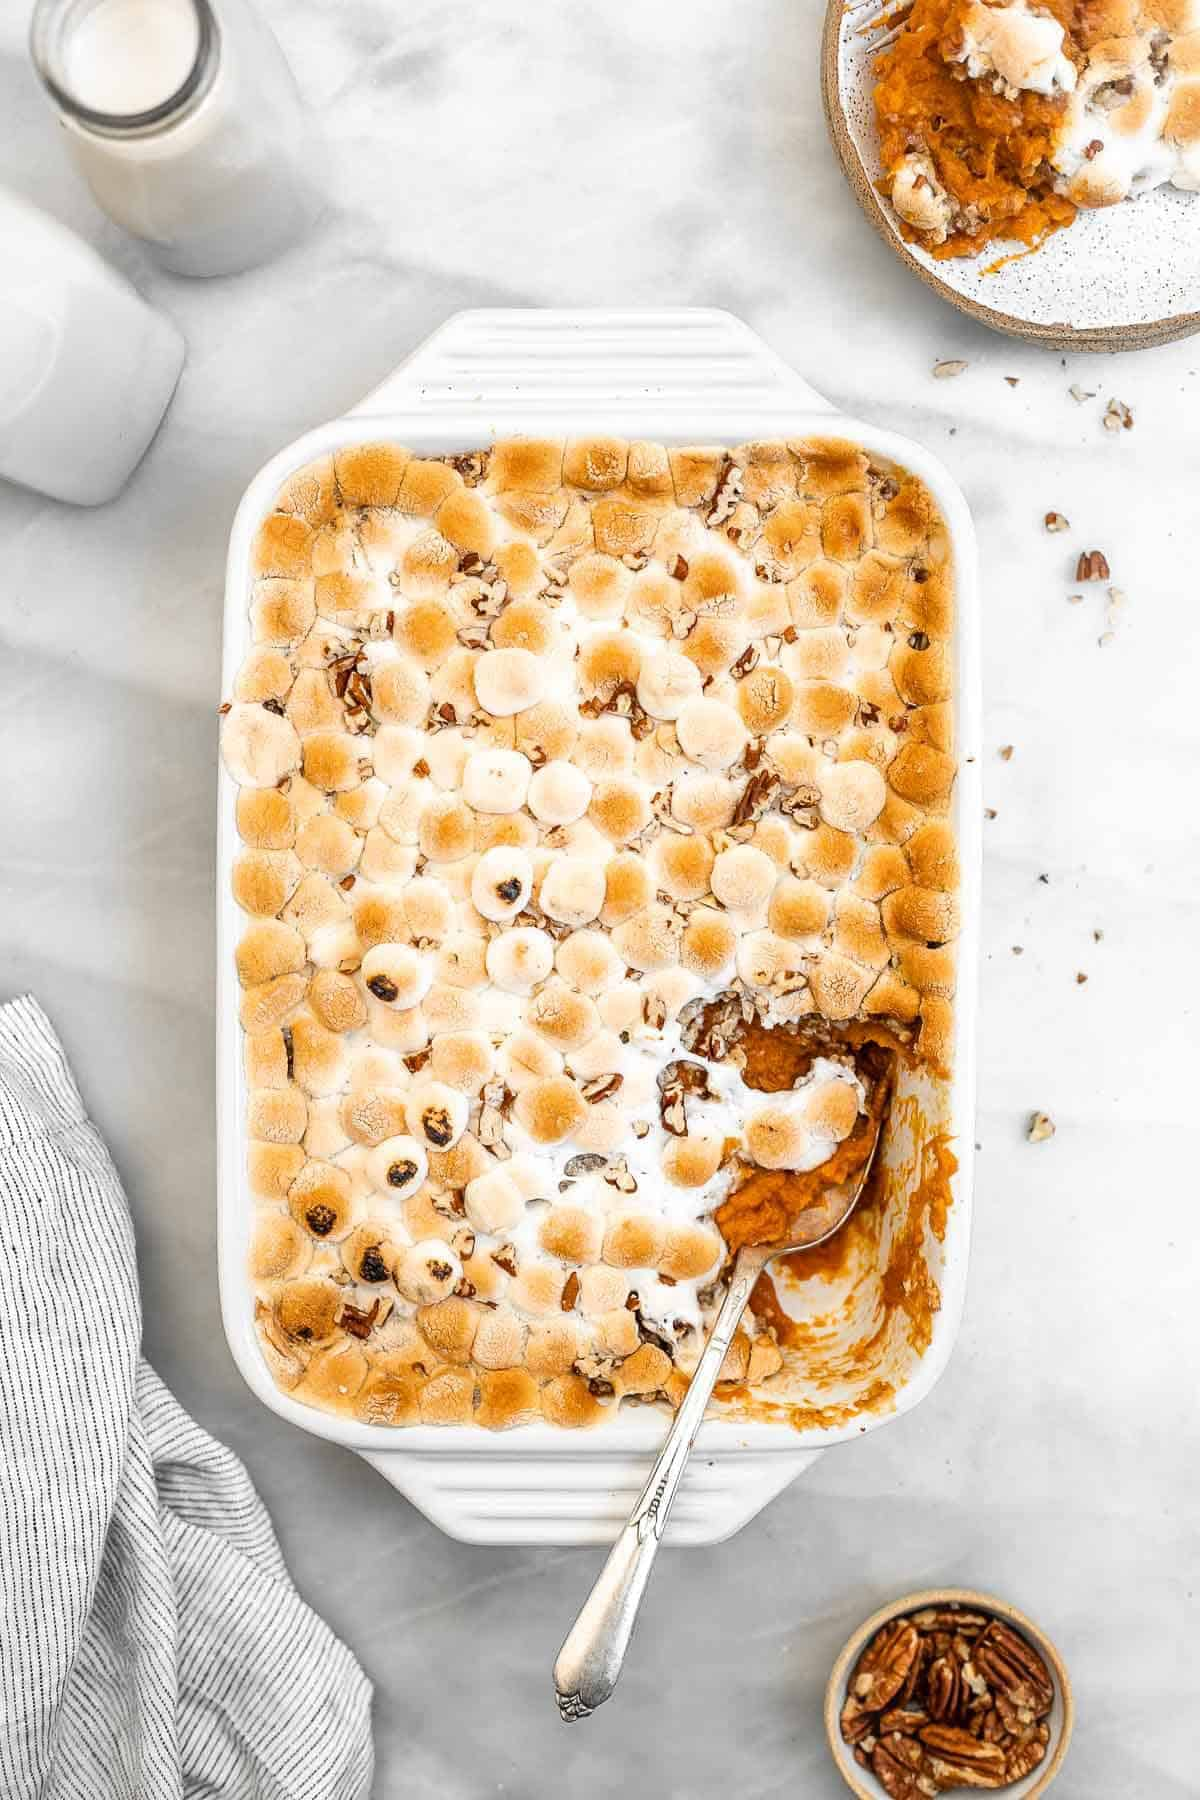 Overhead shot of sweet potato casserole with golden marshmallows.